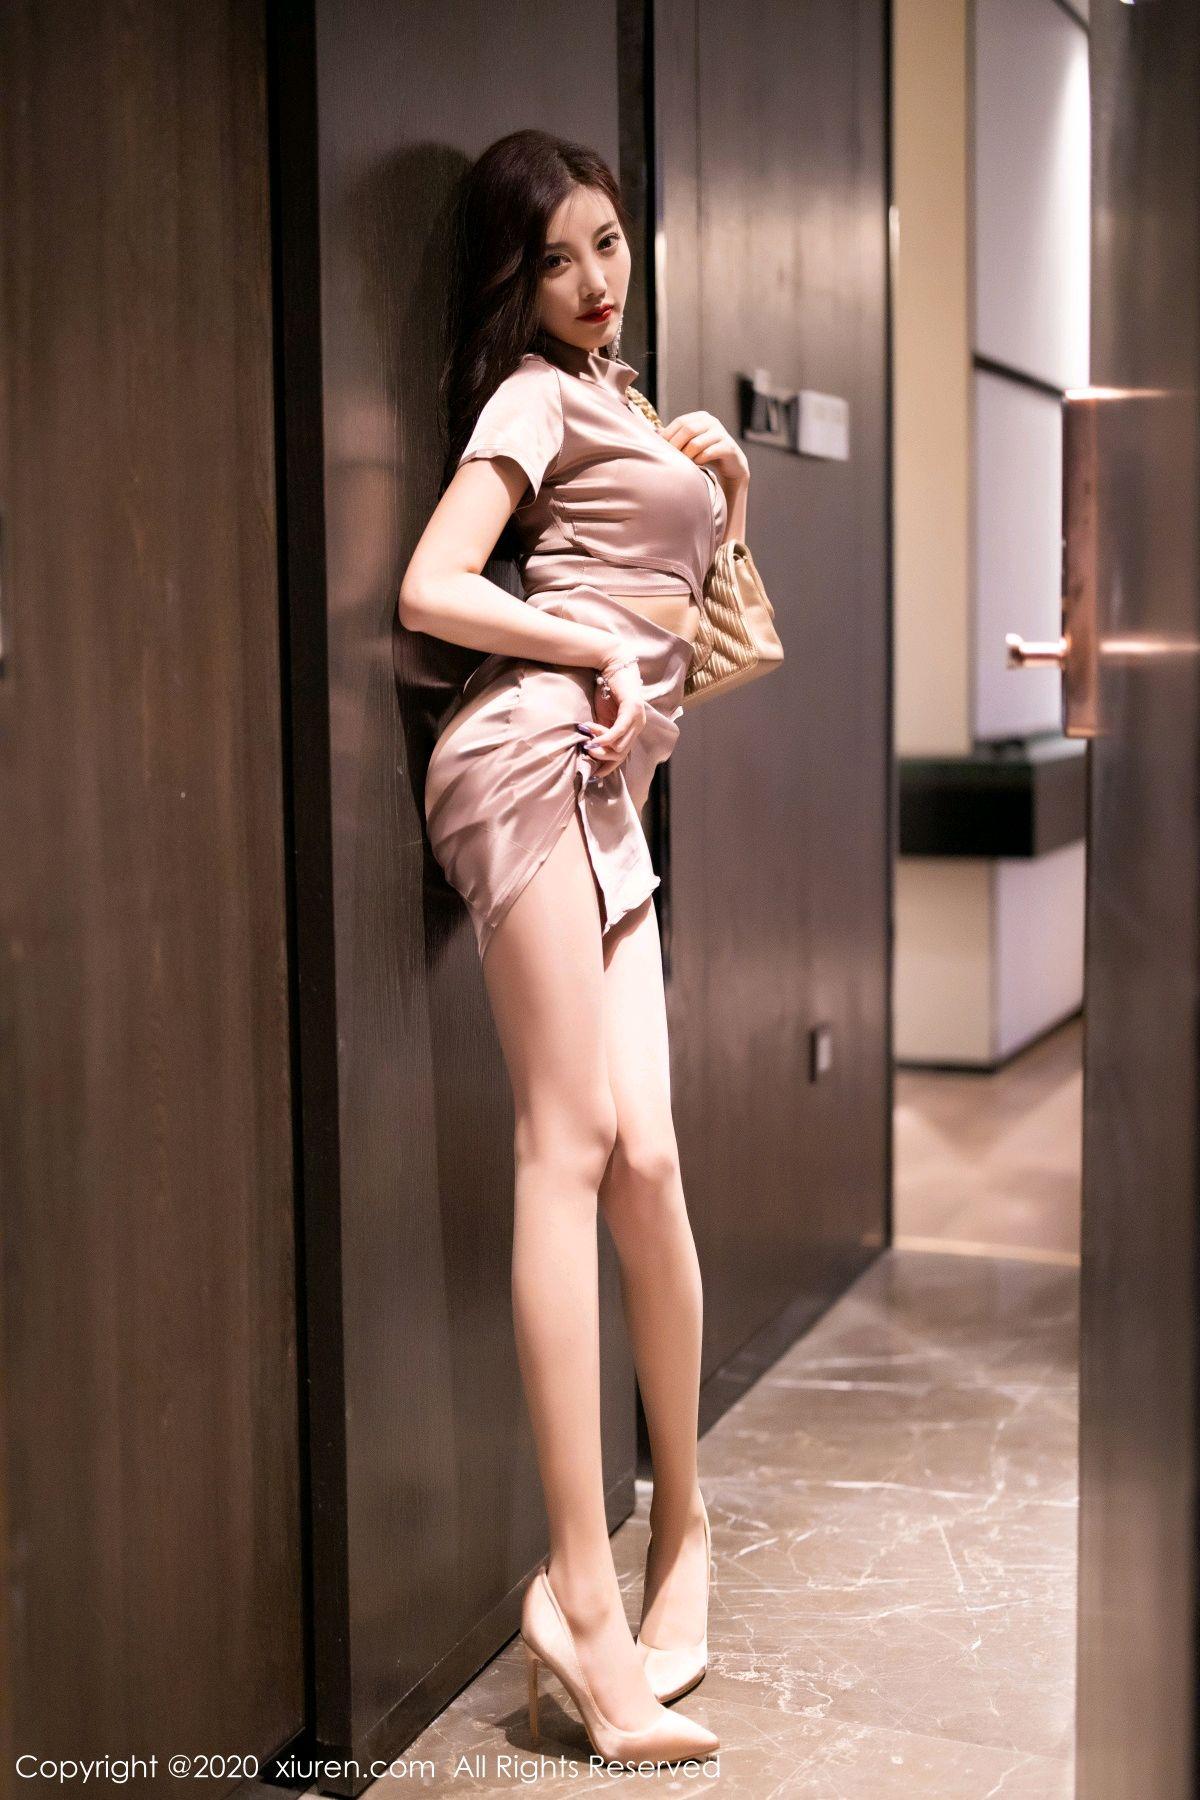 [XiuRen] Vol.2587 Yang Chen Chen 31P, Underwear, Xiuren, Yang Chen Chen